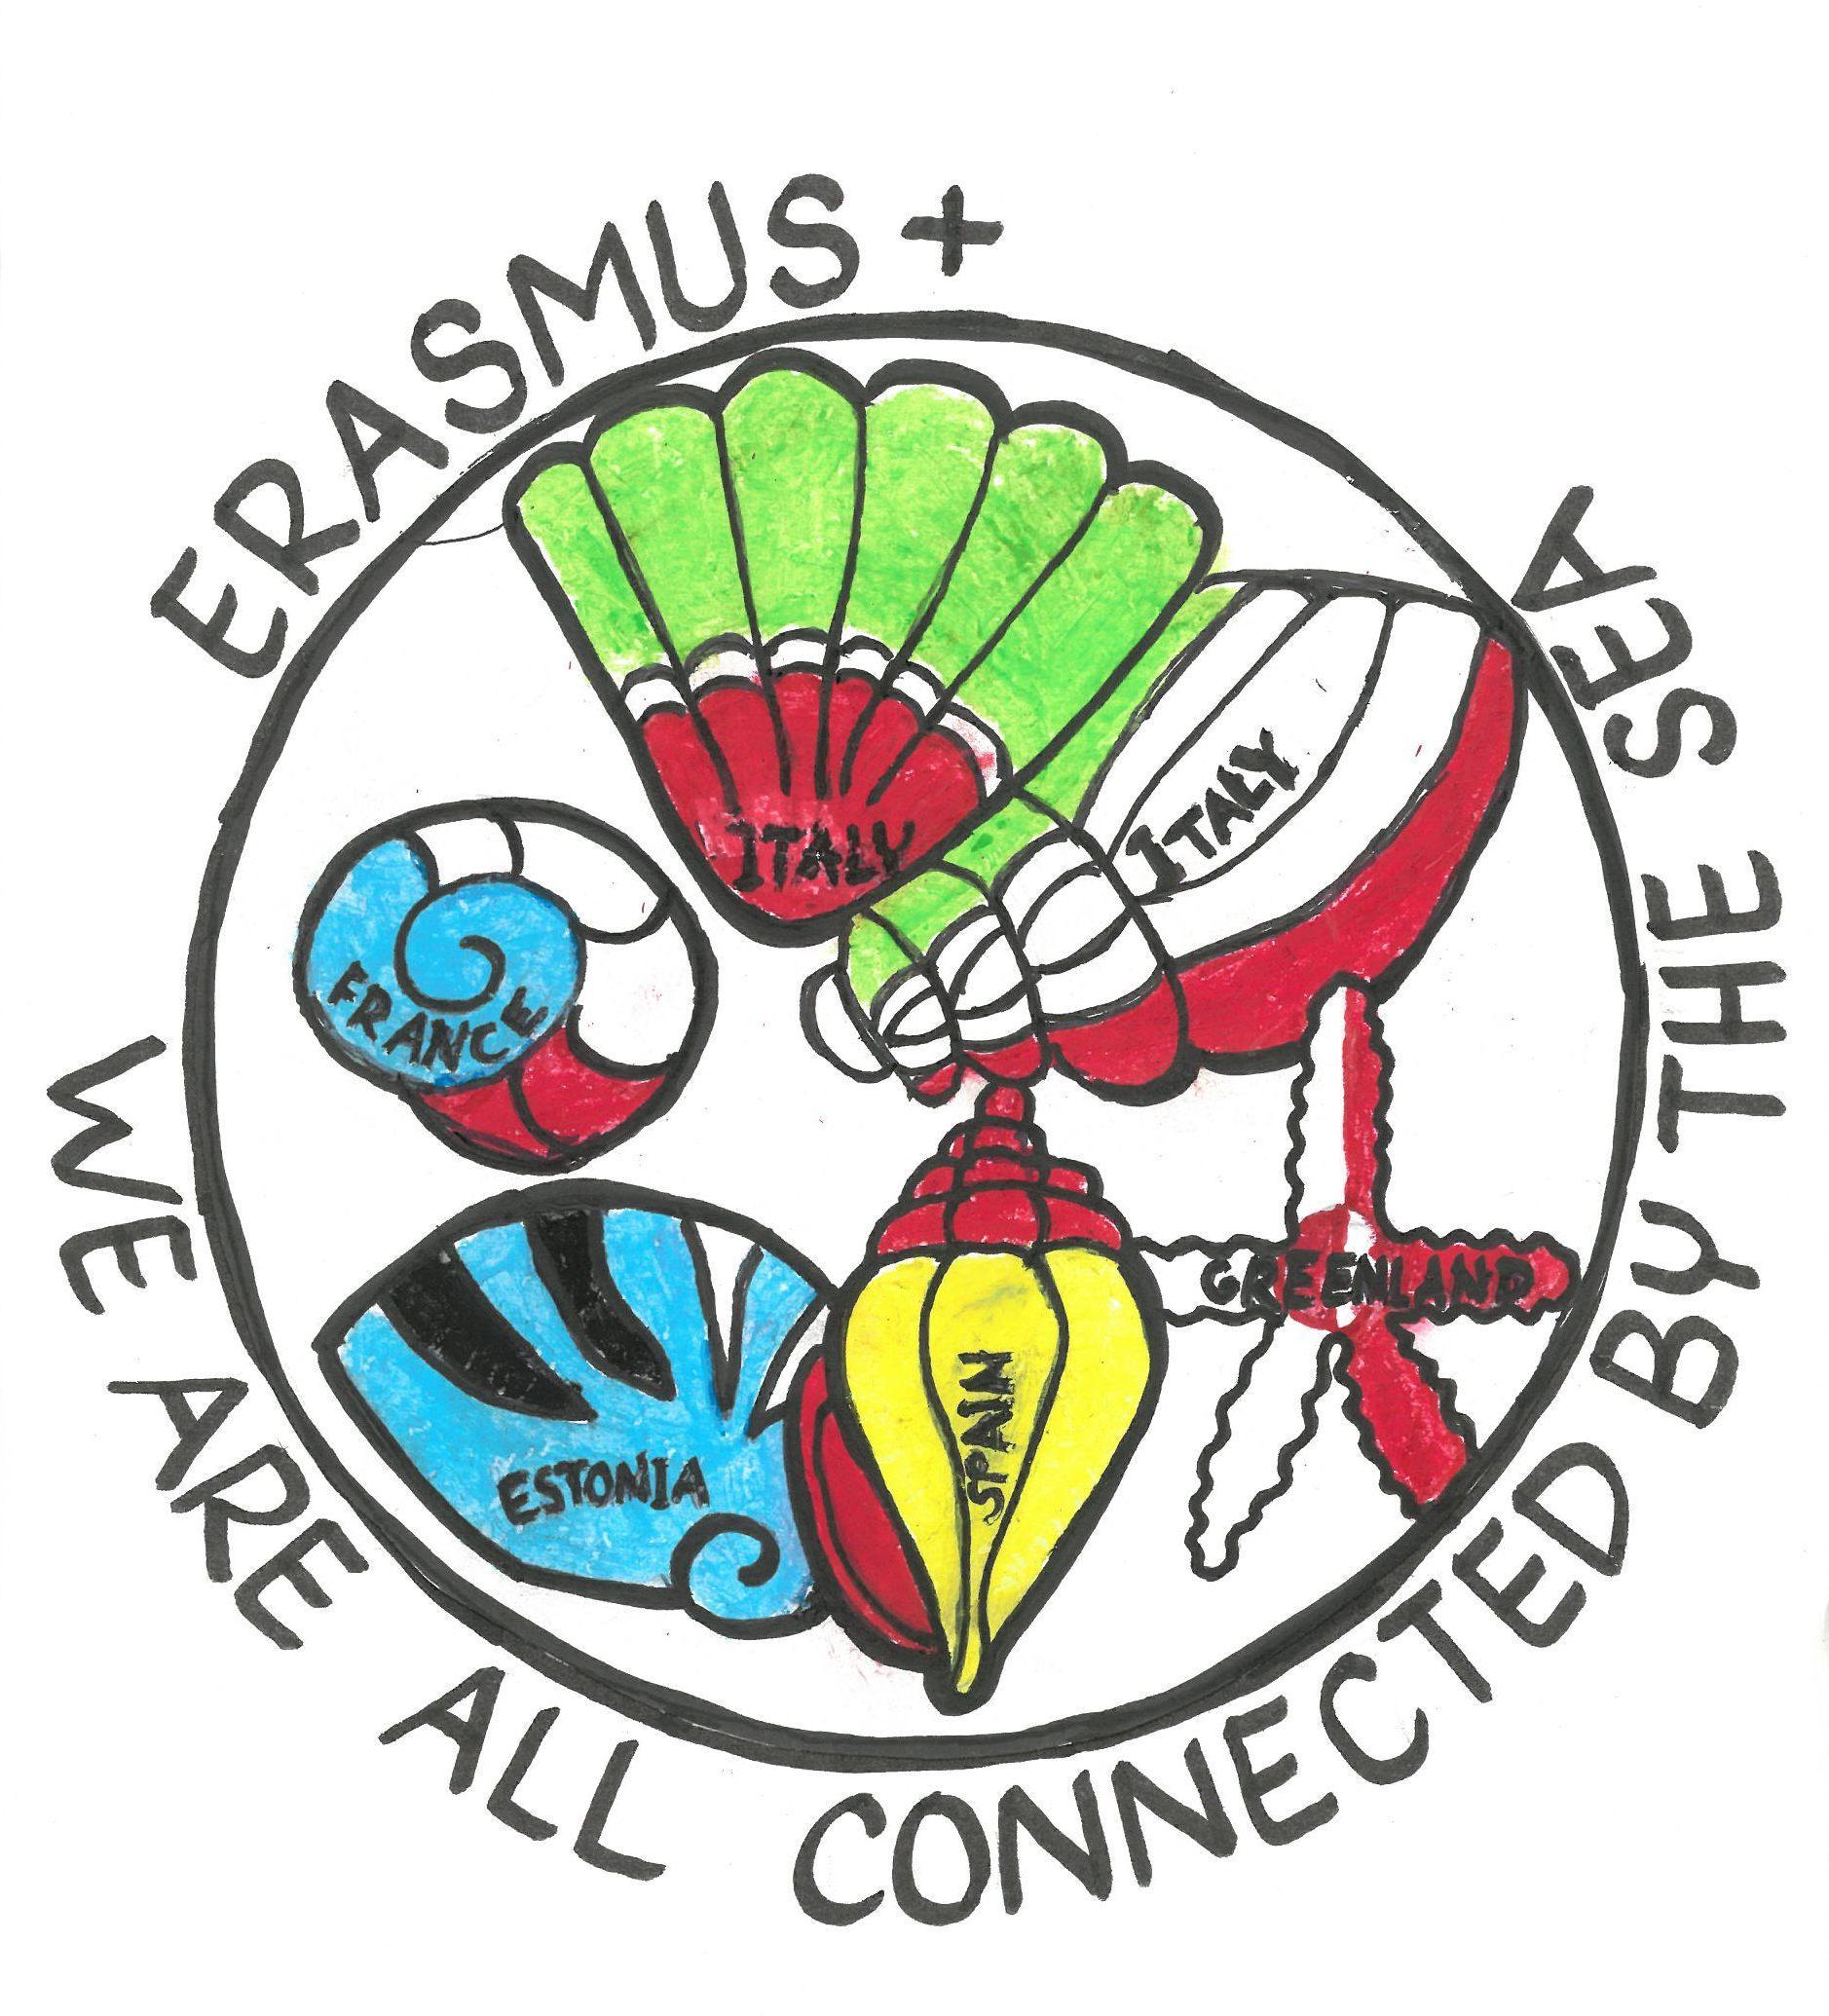 Erasmus+ projekti logo konkursile